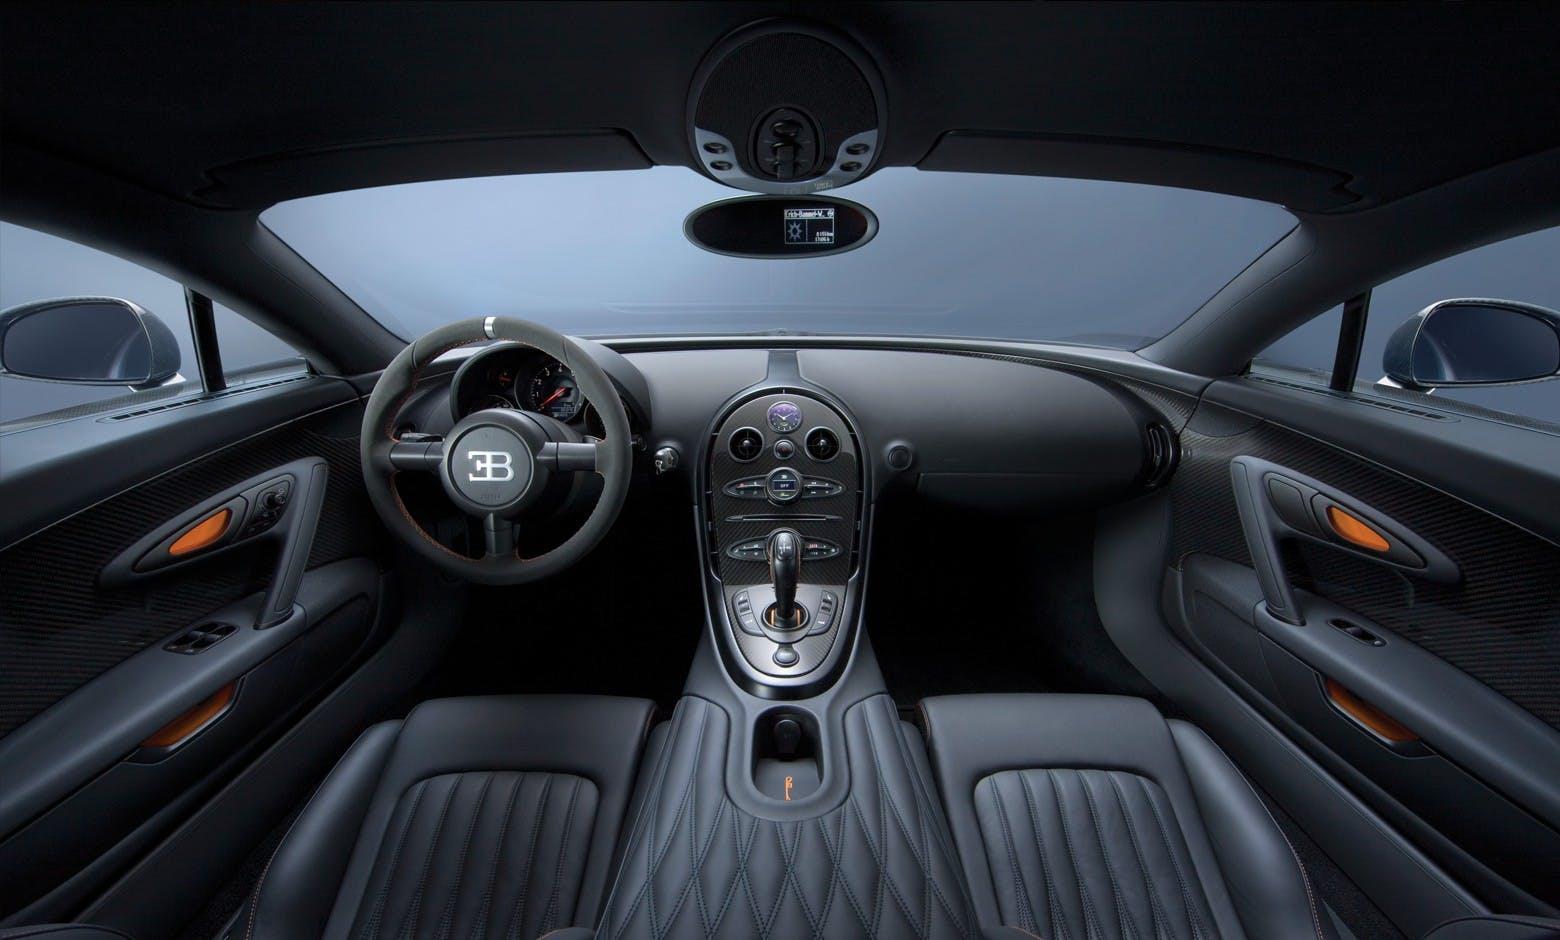 Bugatti Veyron 16.4 Super Sport interni